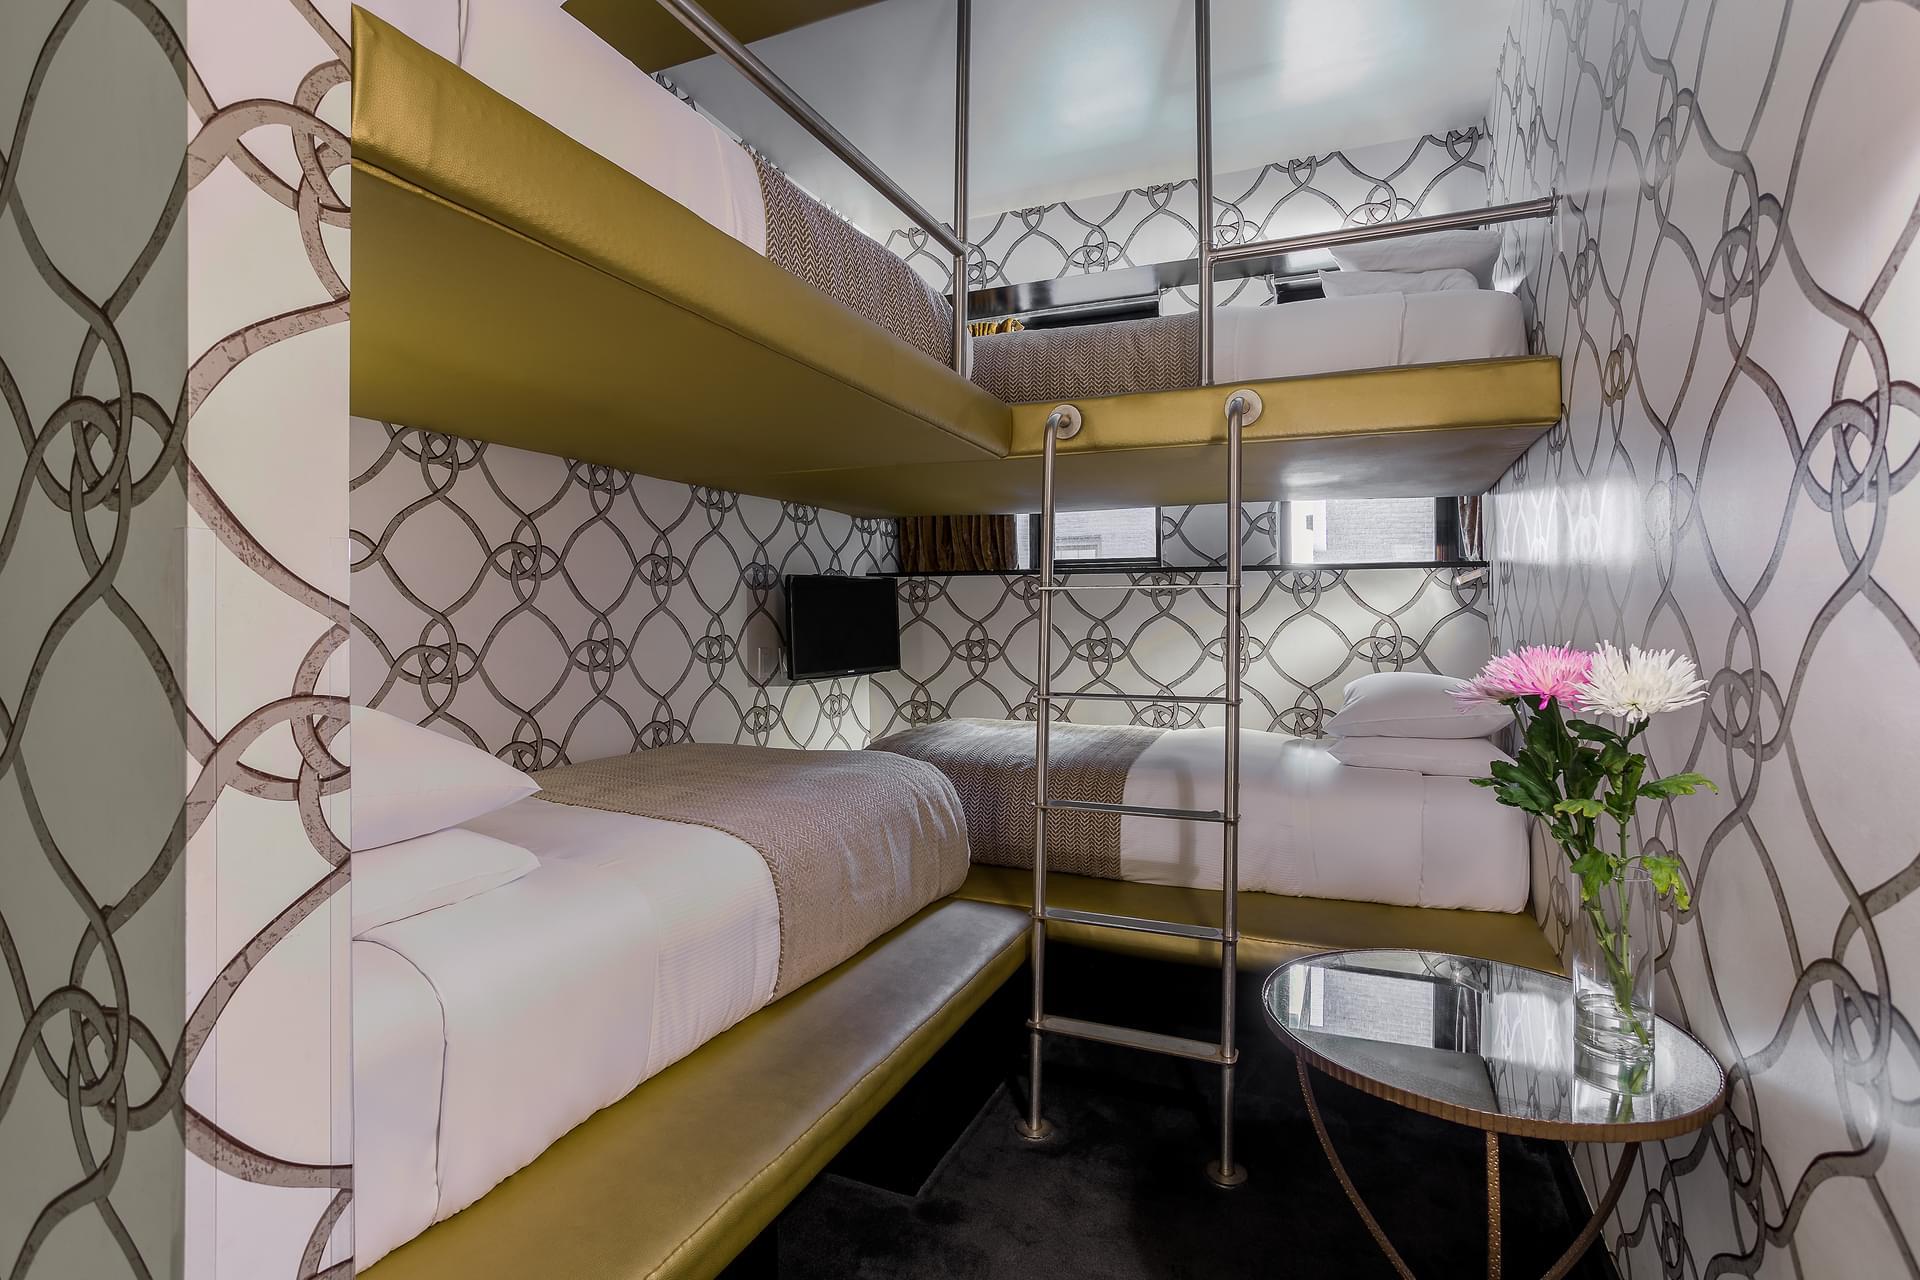 Sarasola Room Mate Grace